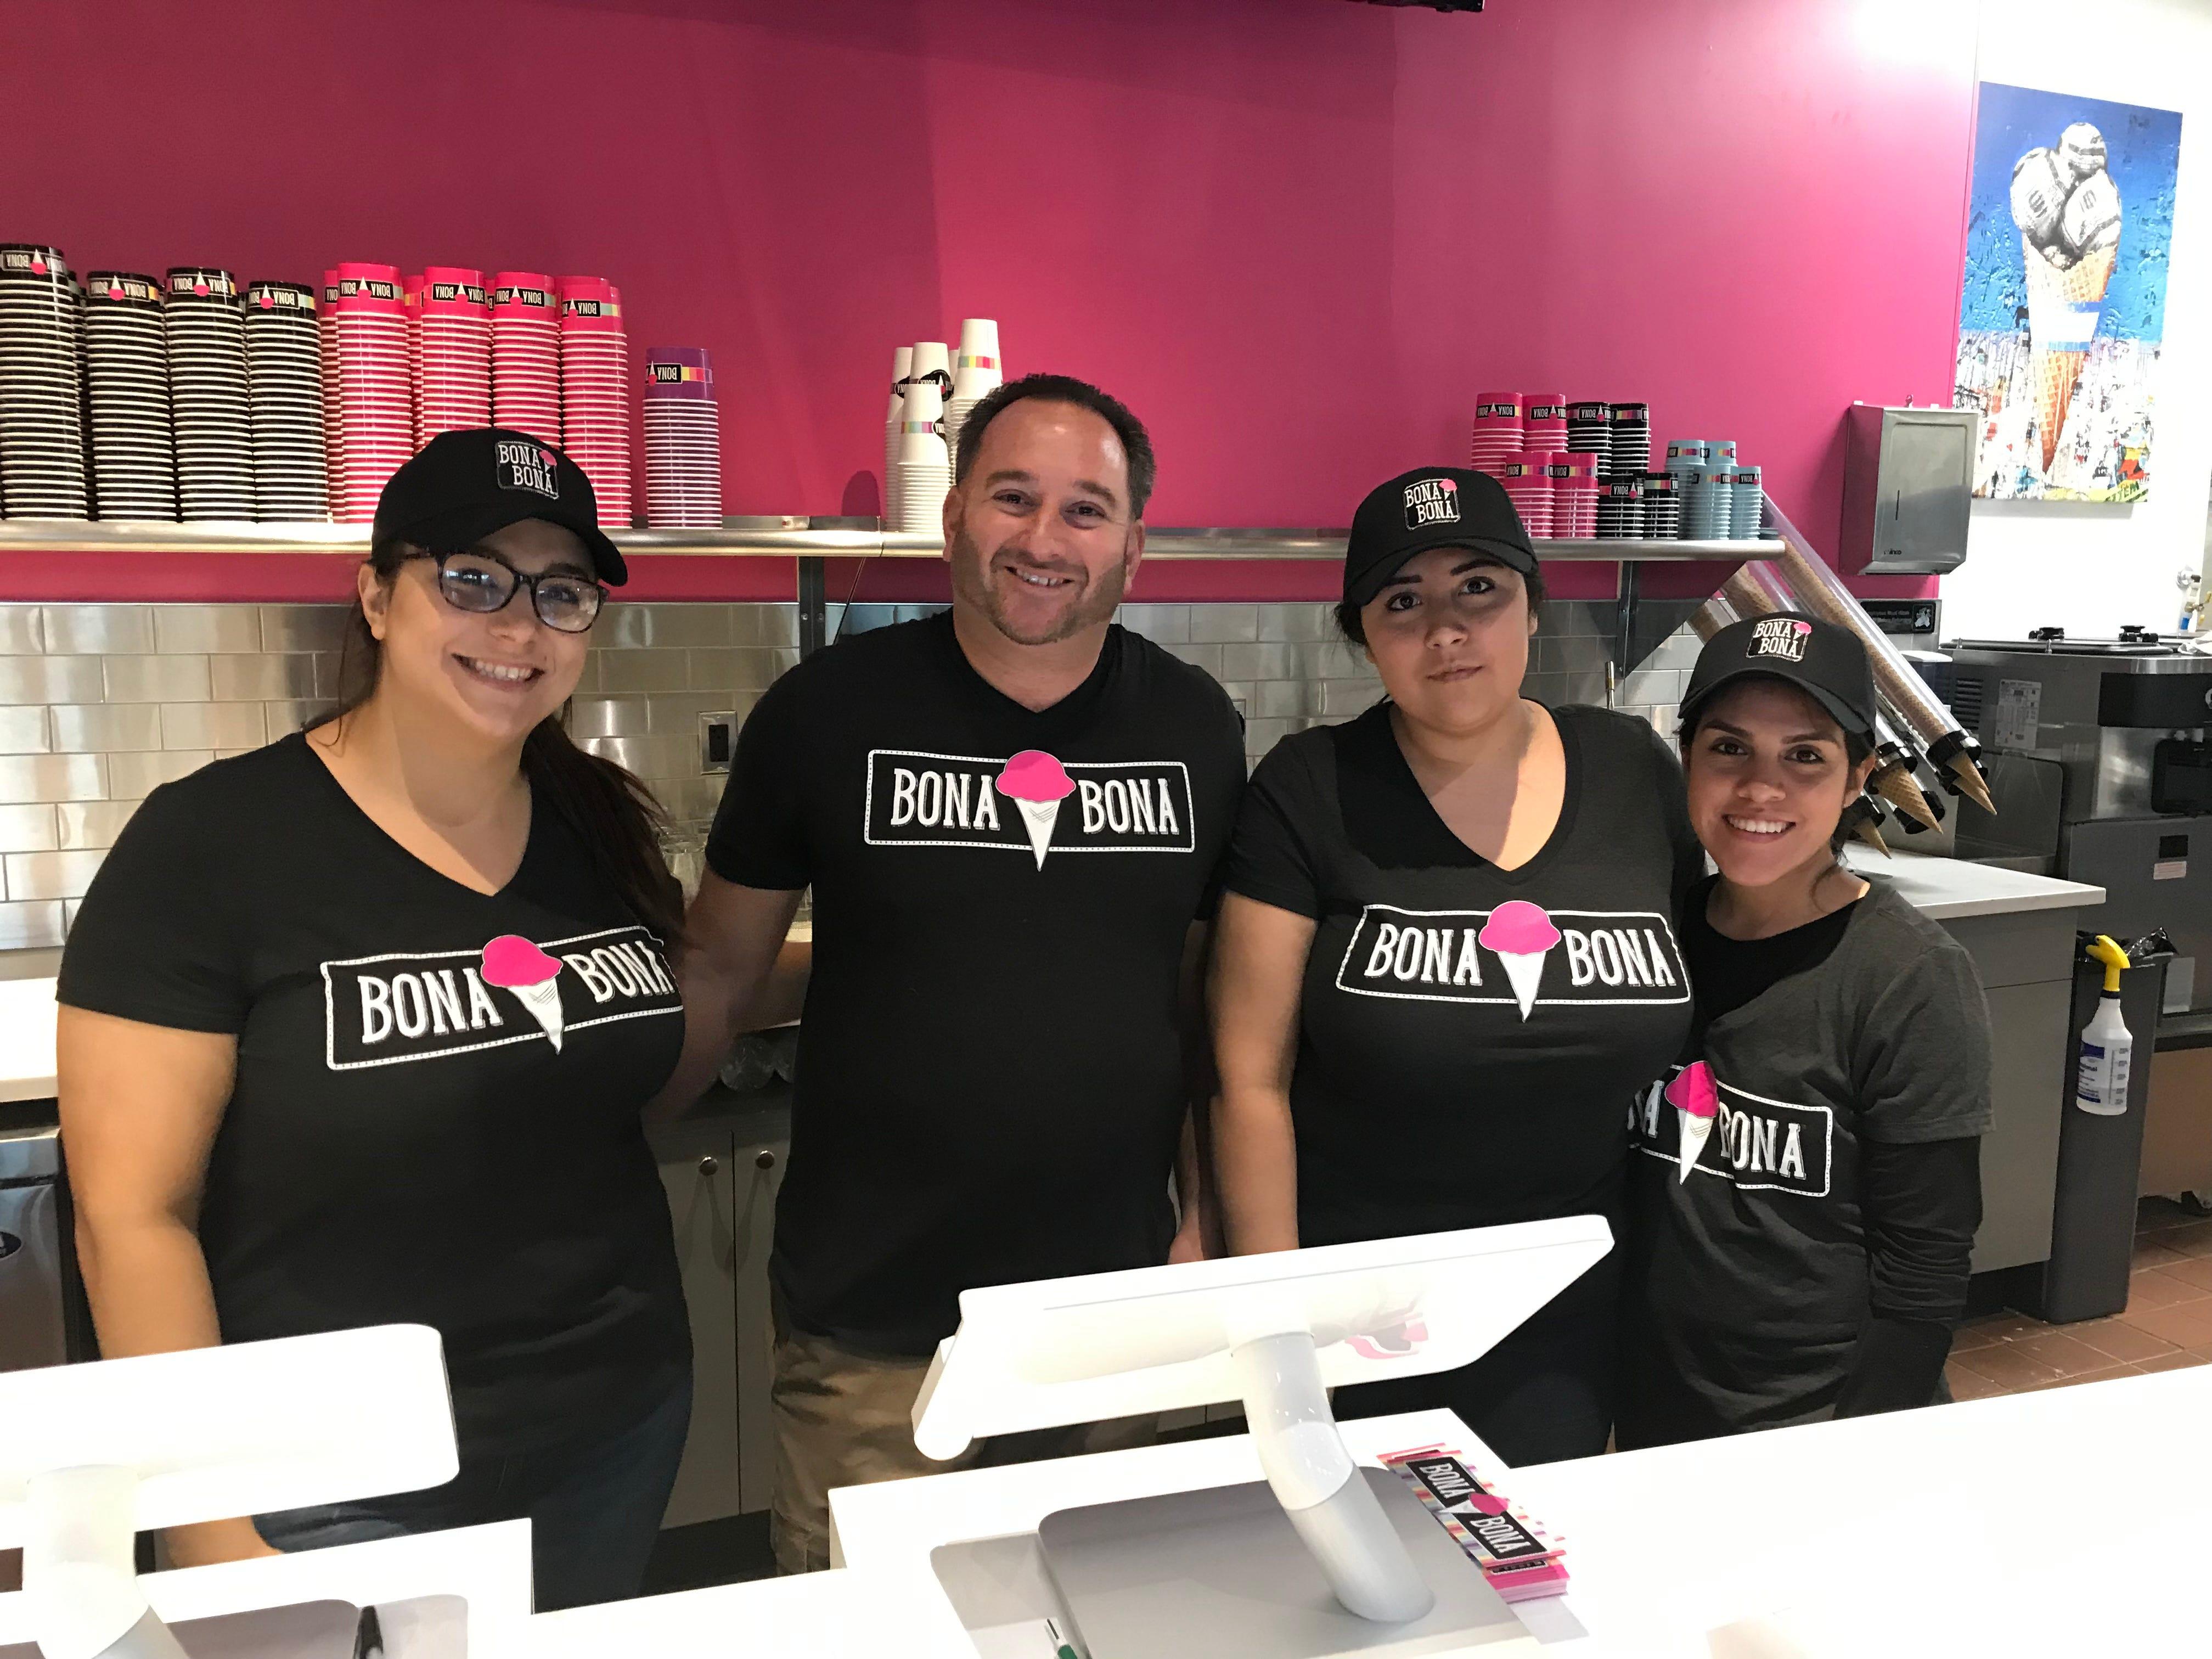 Bona Bona Ice Cream staff, left to right, Dawn Demi, owner Scott Herman, Esmeralda Perez and Keiry Gomez. Photographed Dec. 4, 2018.